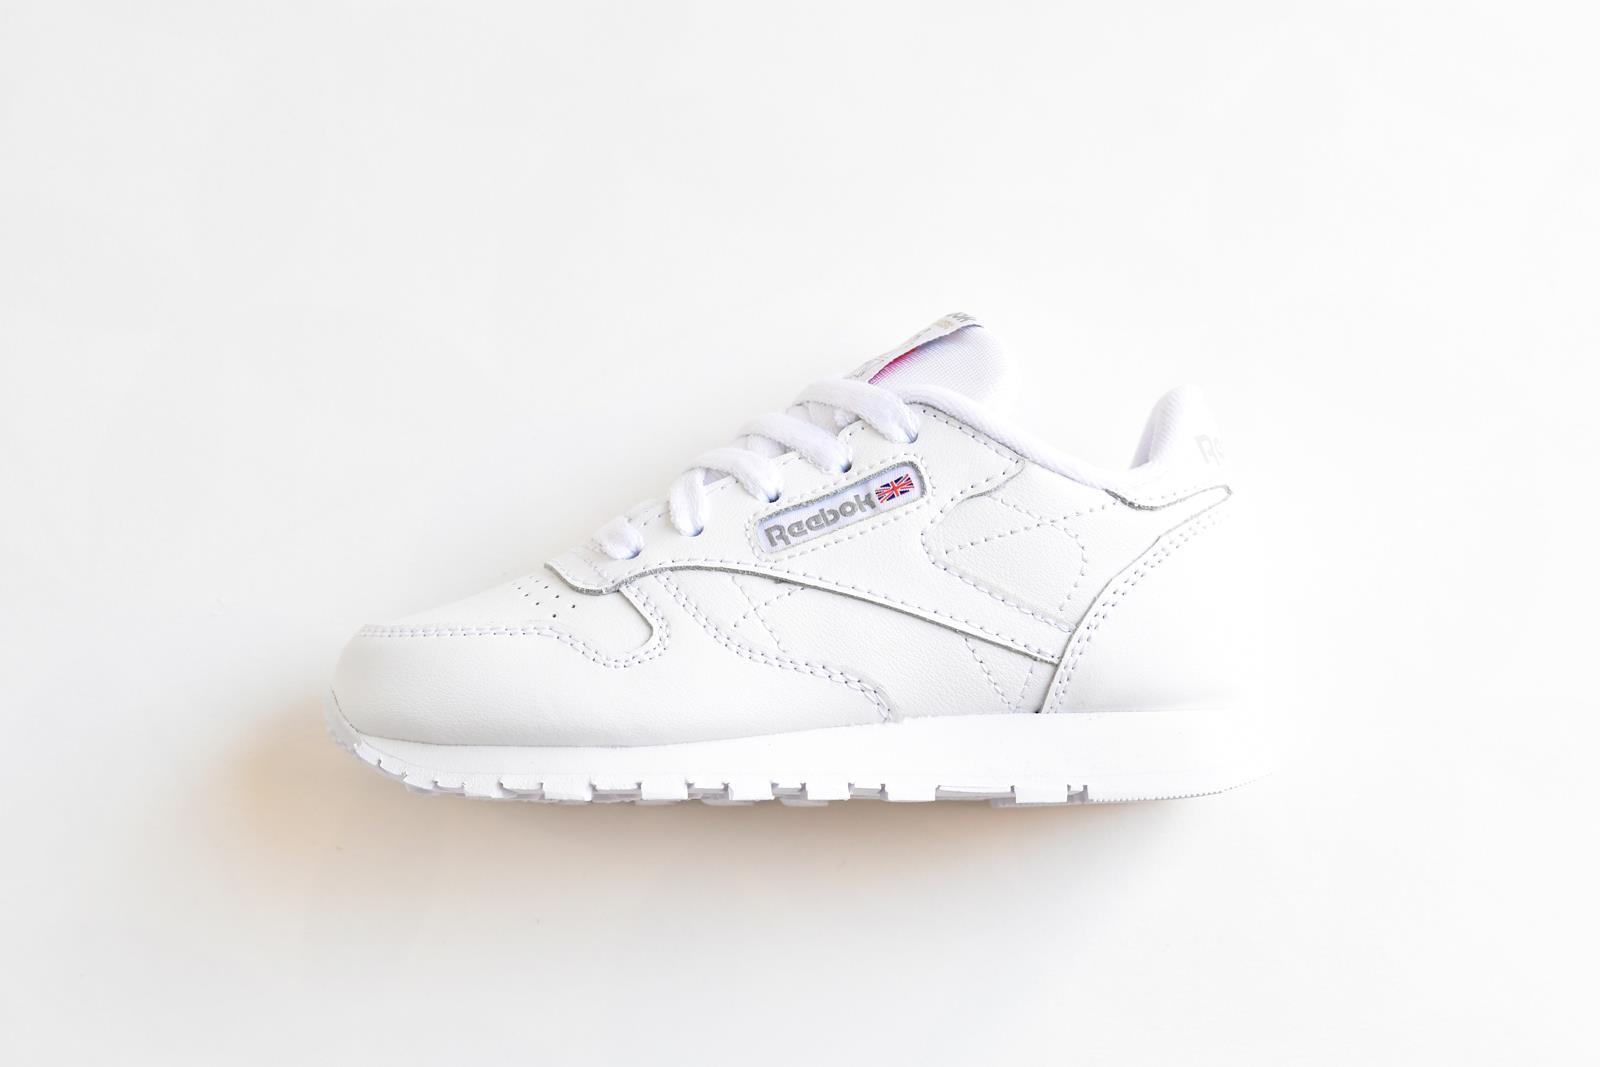 reebok classic leather blanca cordones 50172